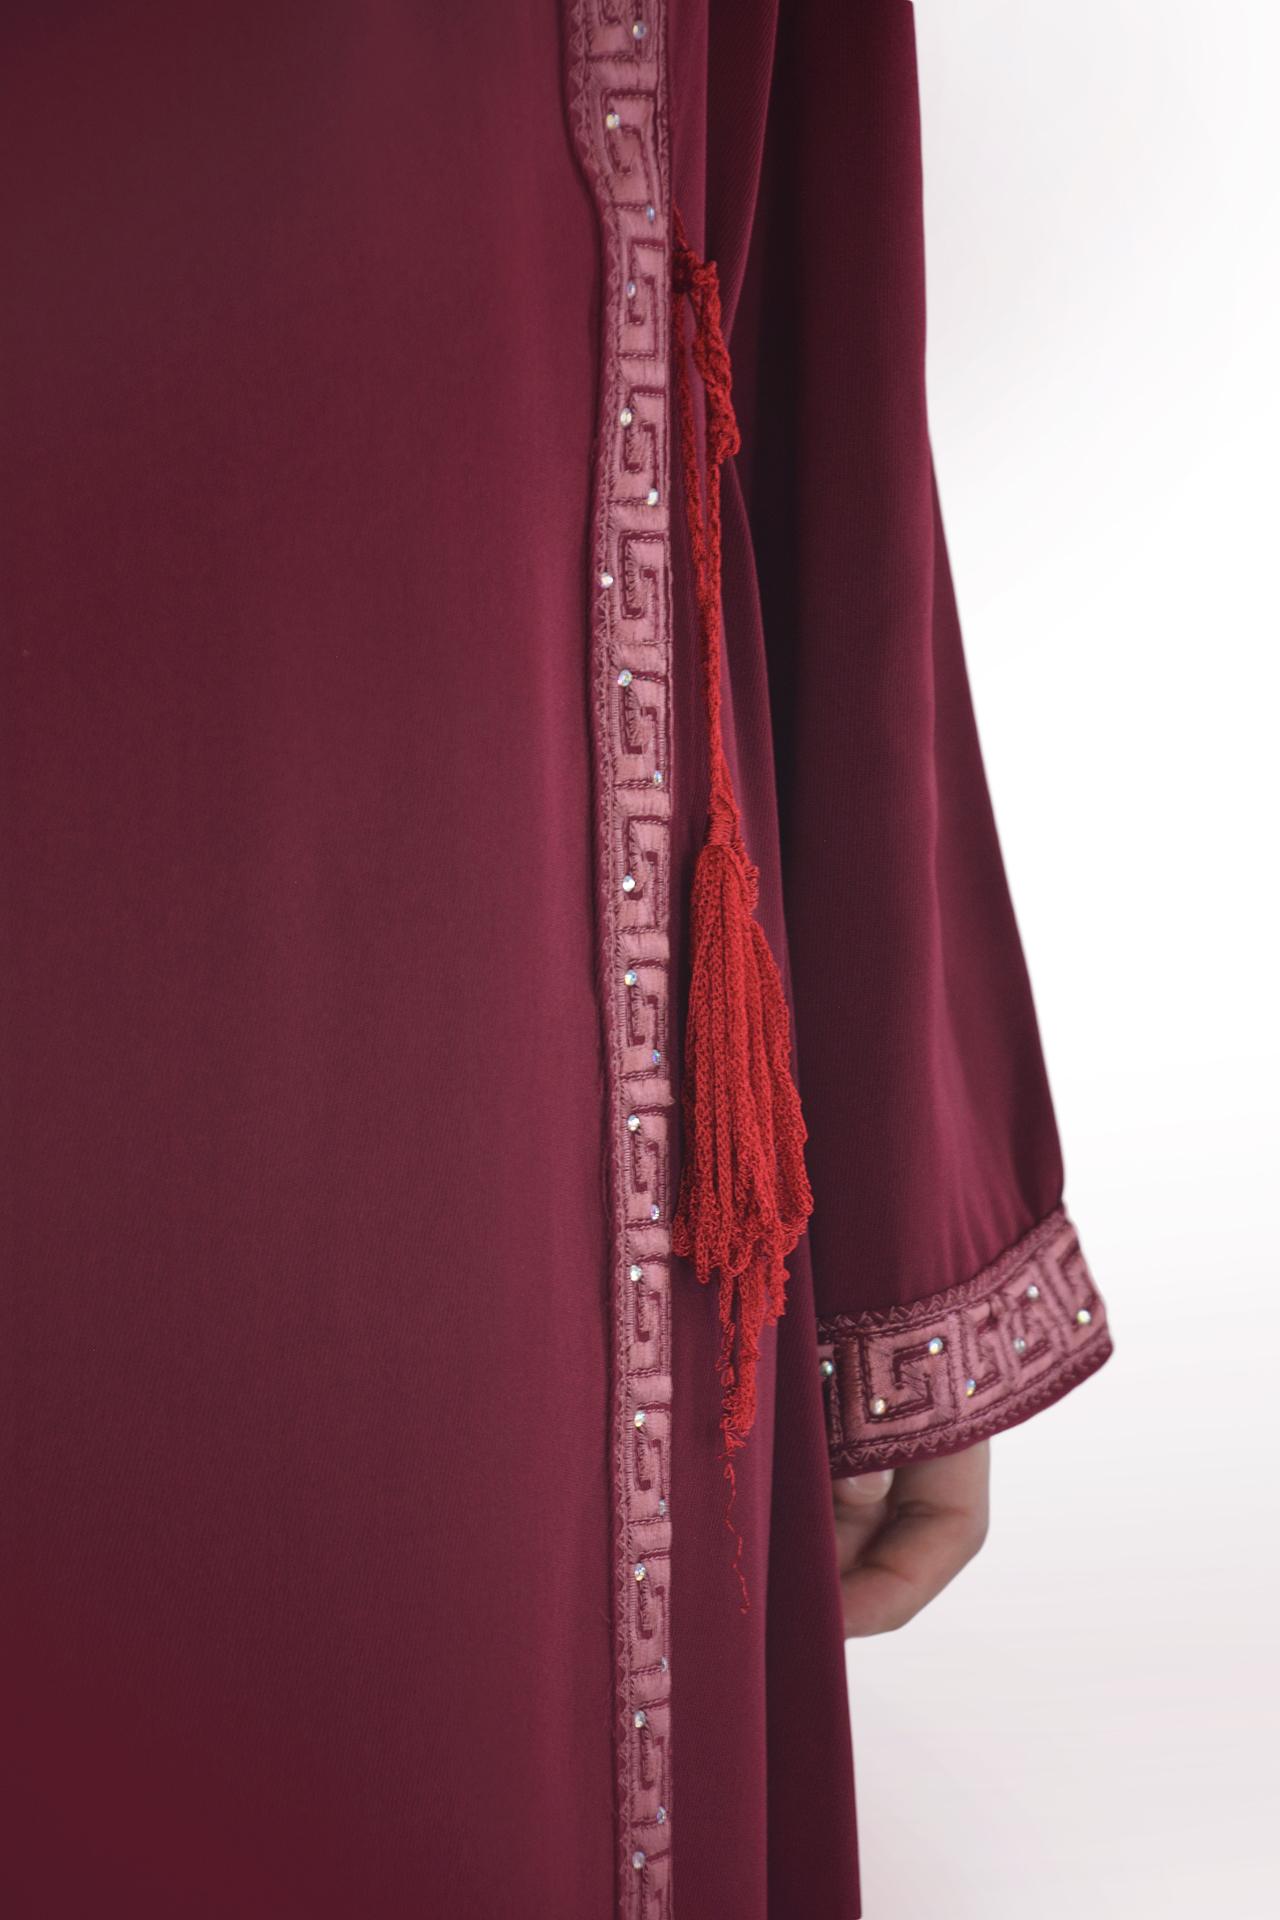 Khalila - Maroon Wrap-Around Abaya Close up 2